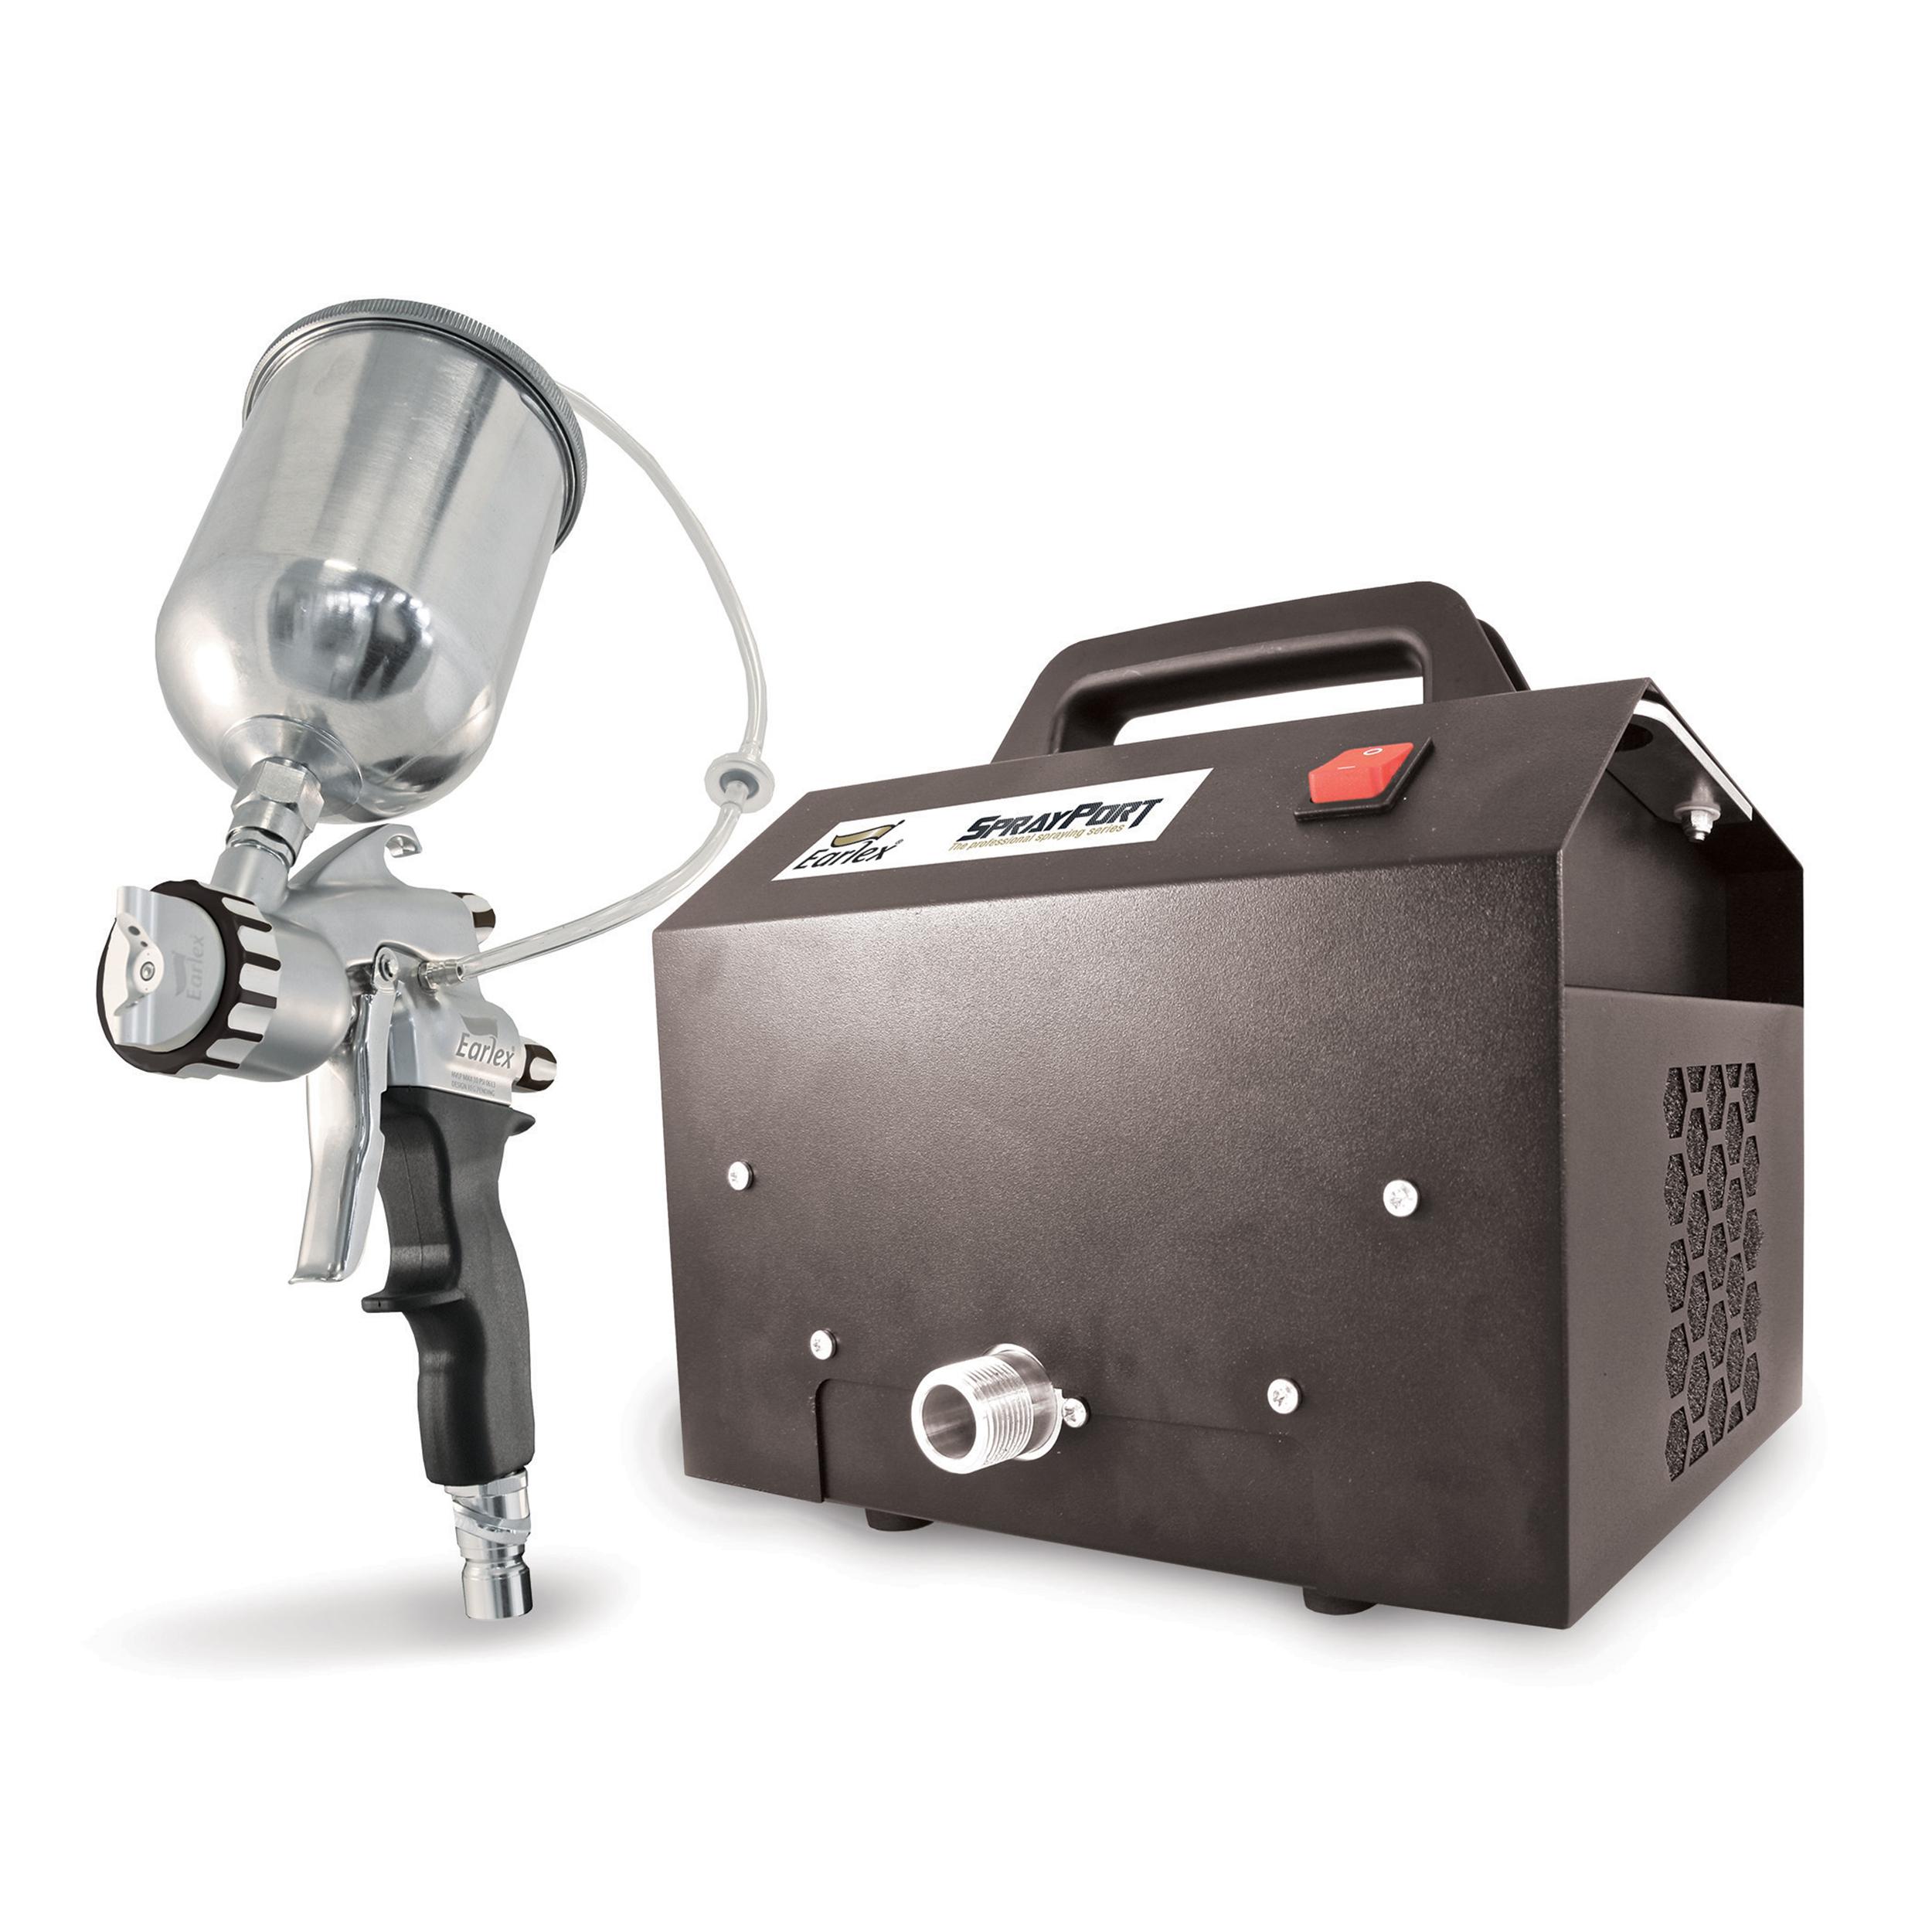 SprayPort 6003 with Gravity Feed Pro 8 Spray Gun, 6003-G